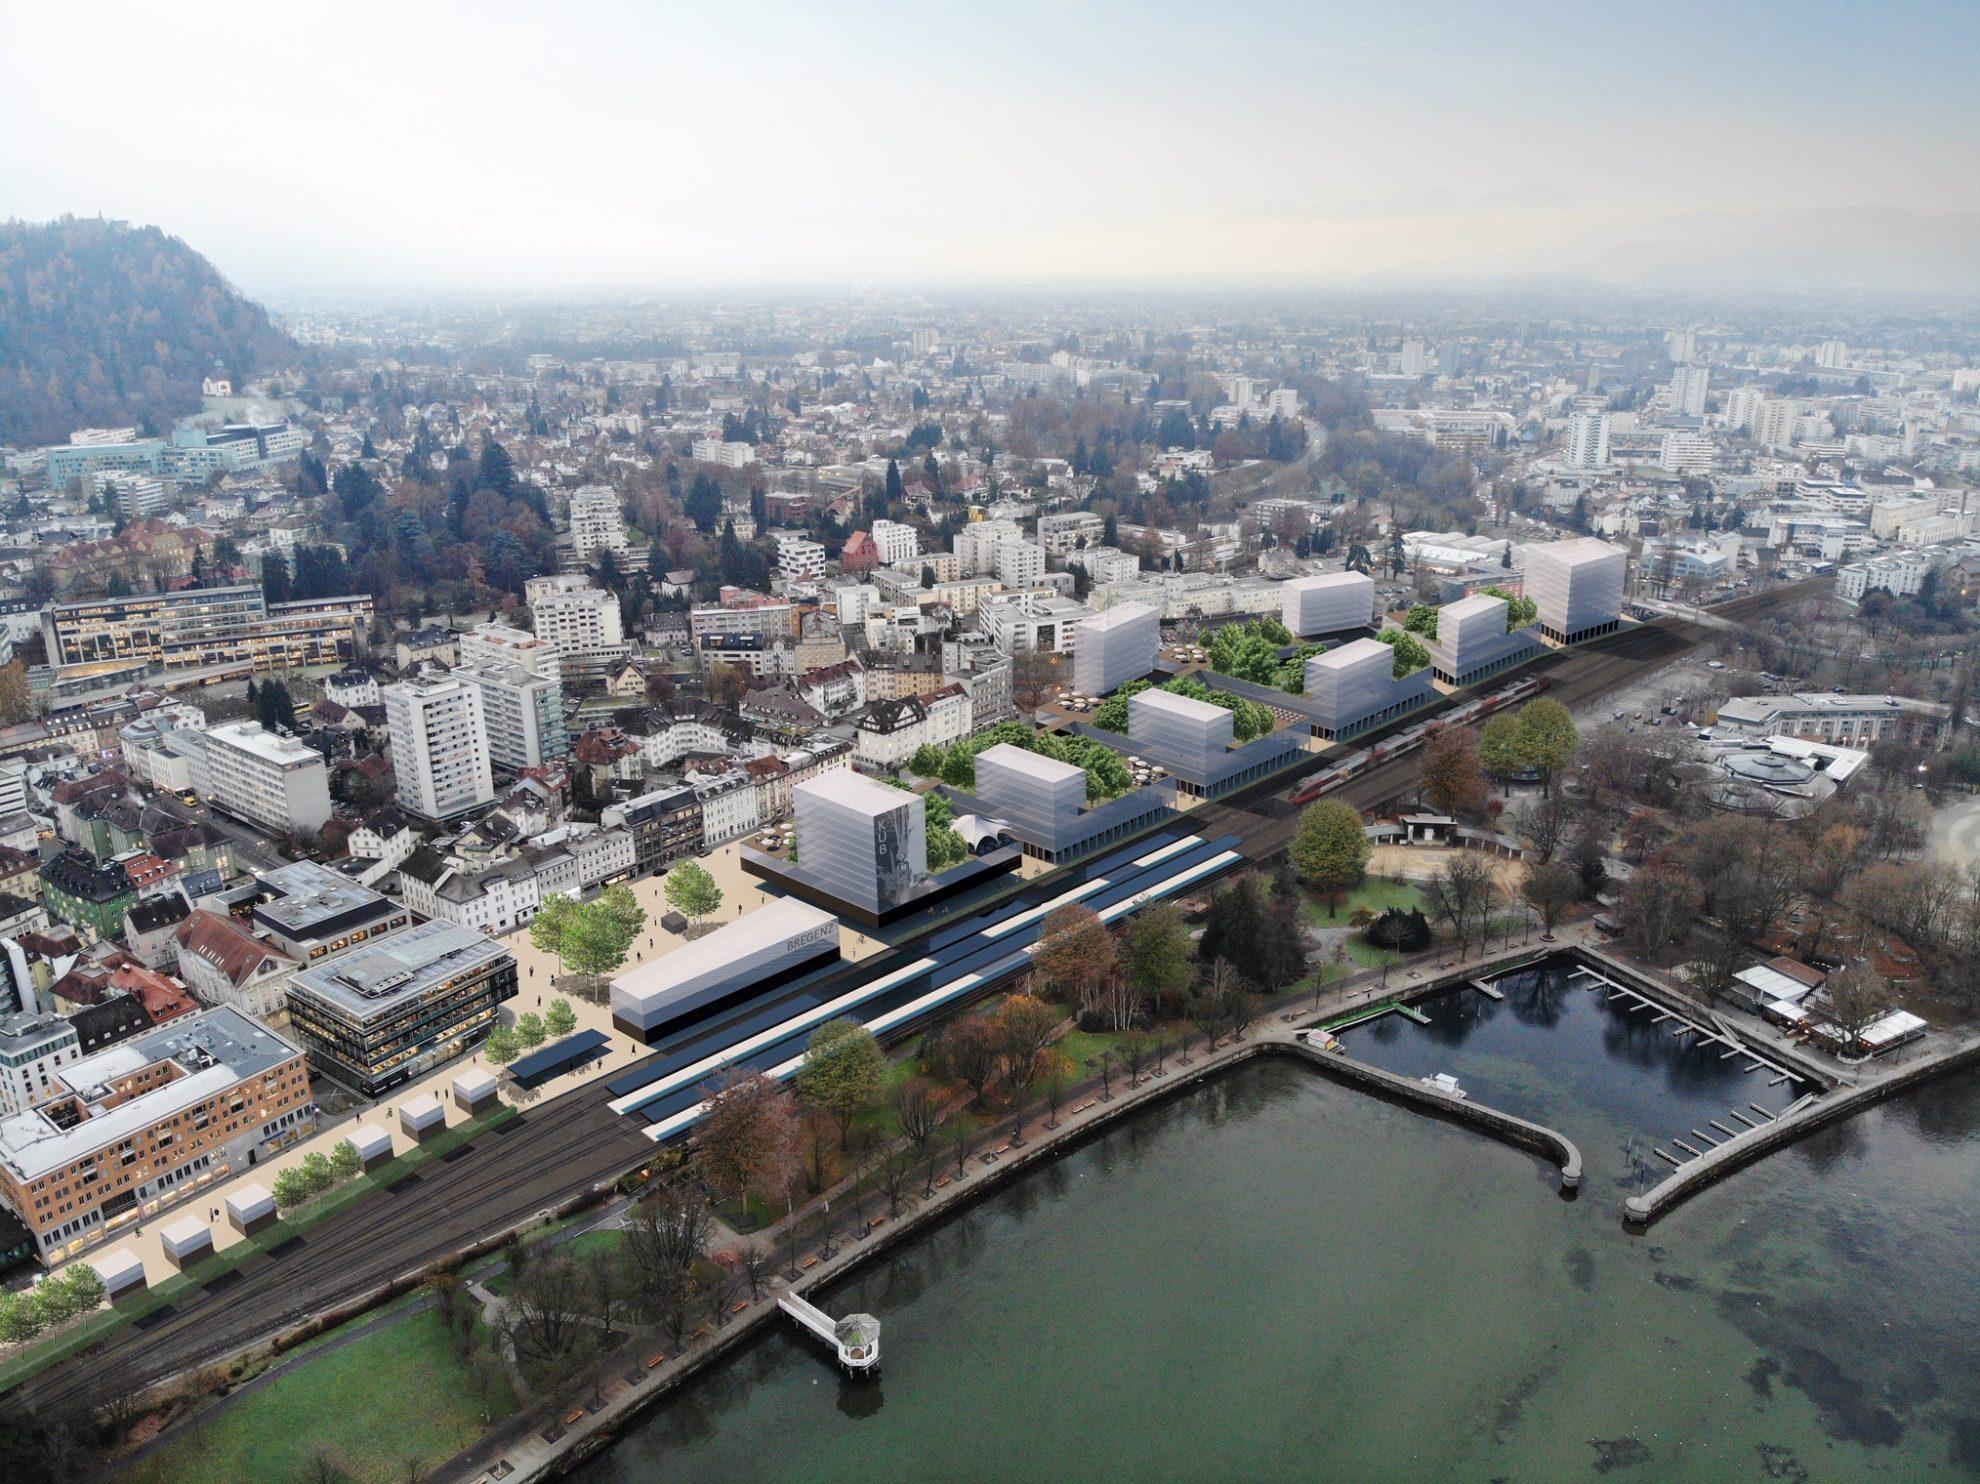 Vision Urbanes Leben Bregenz